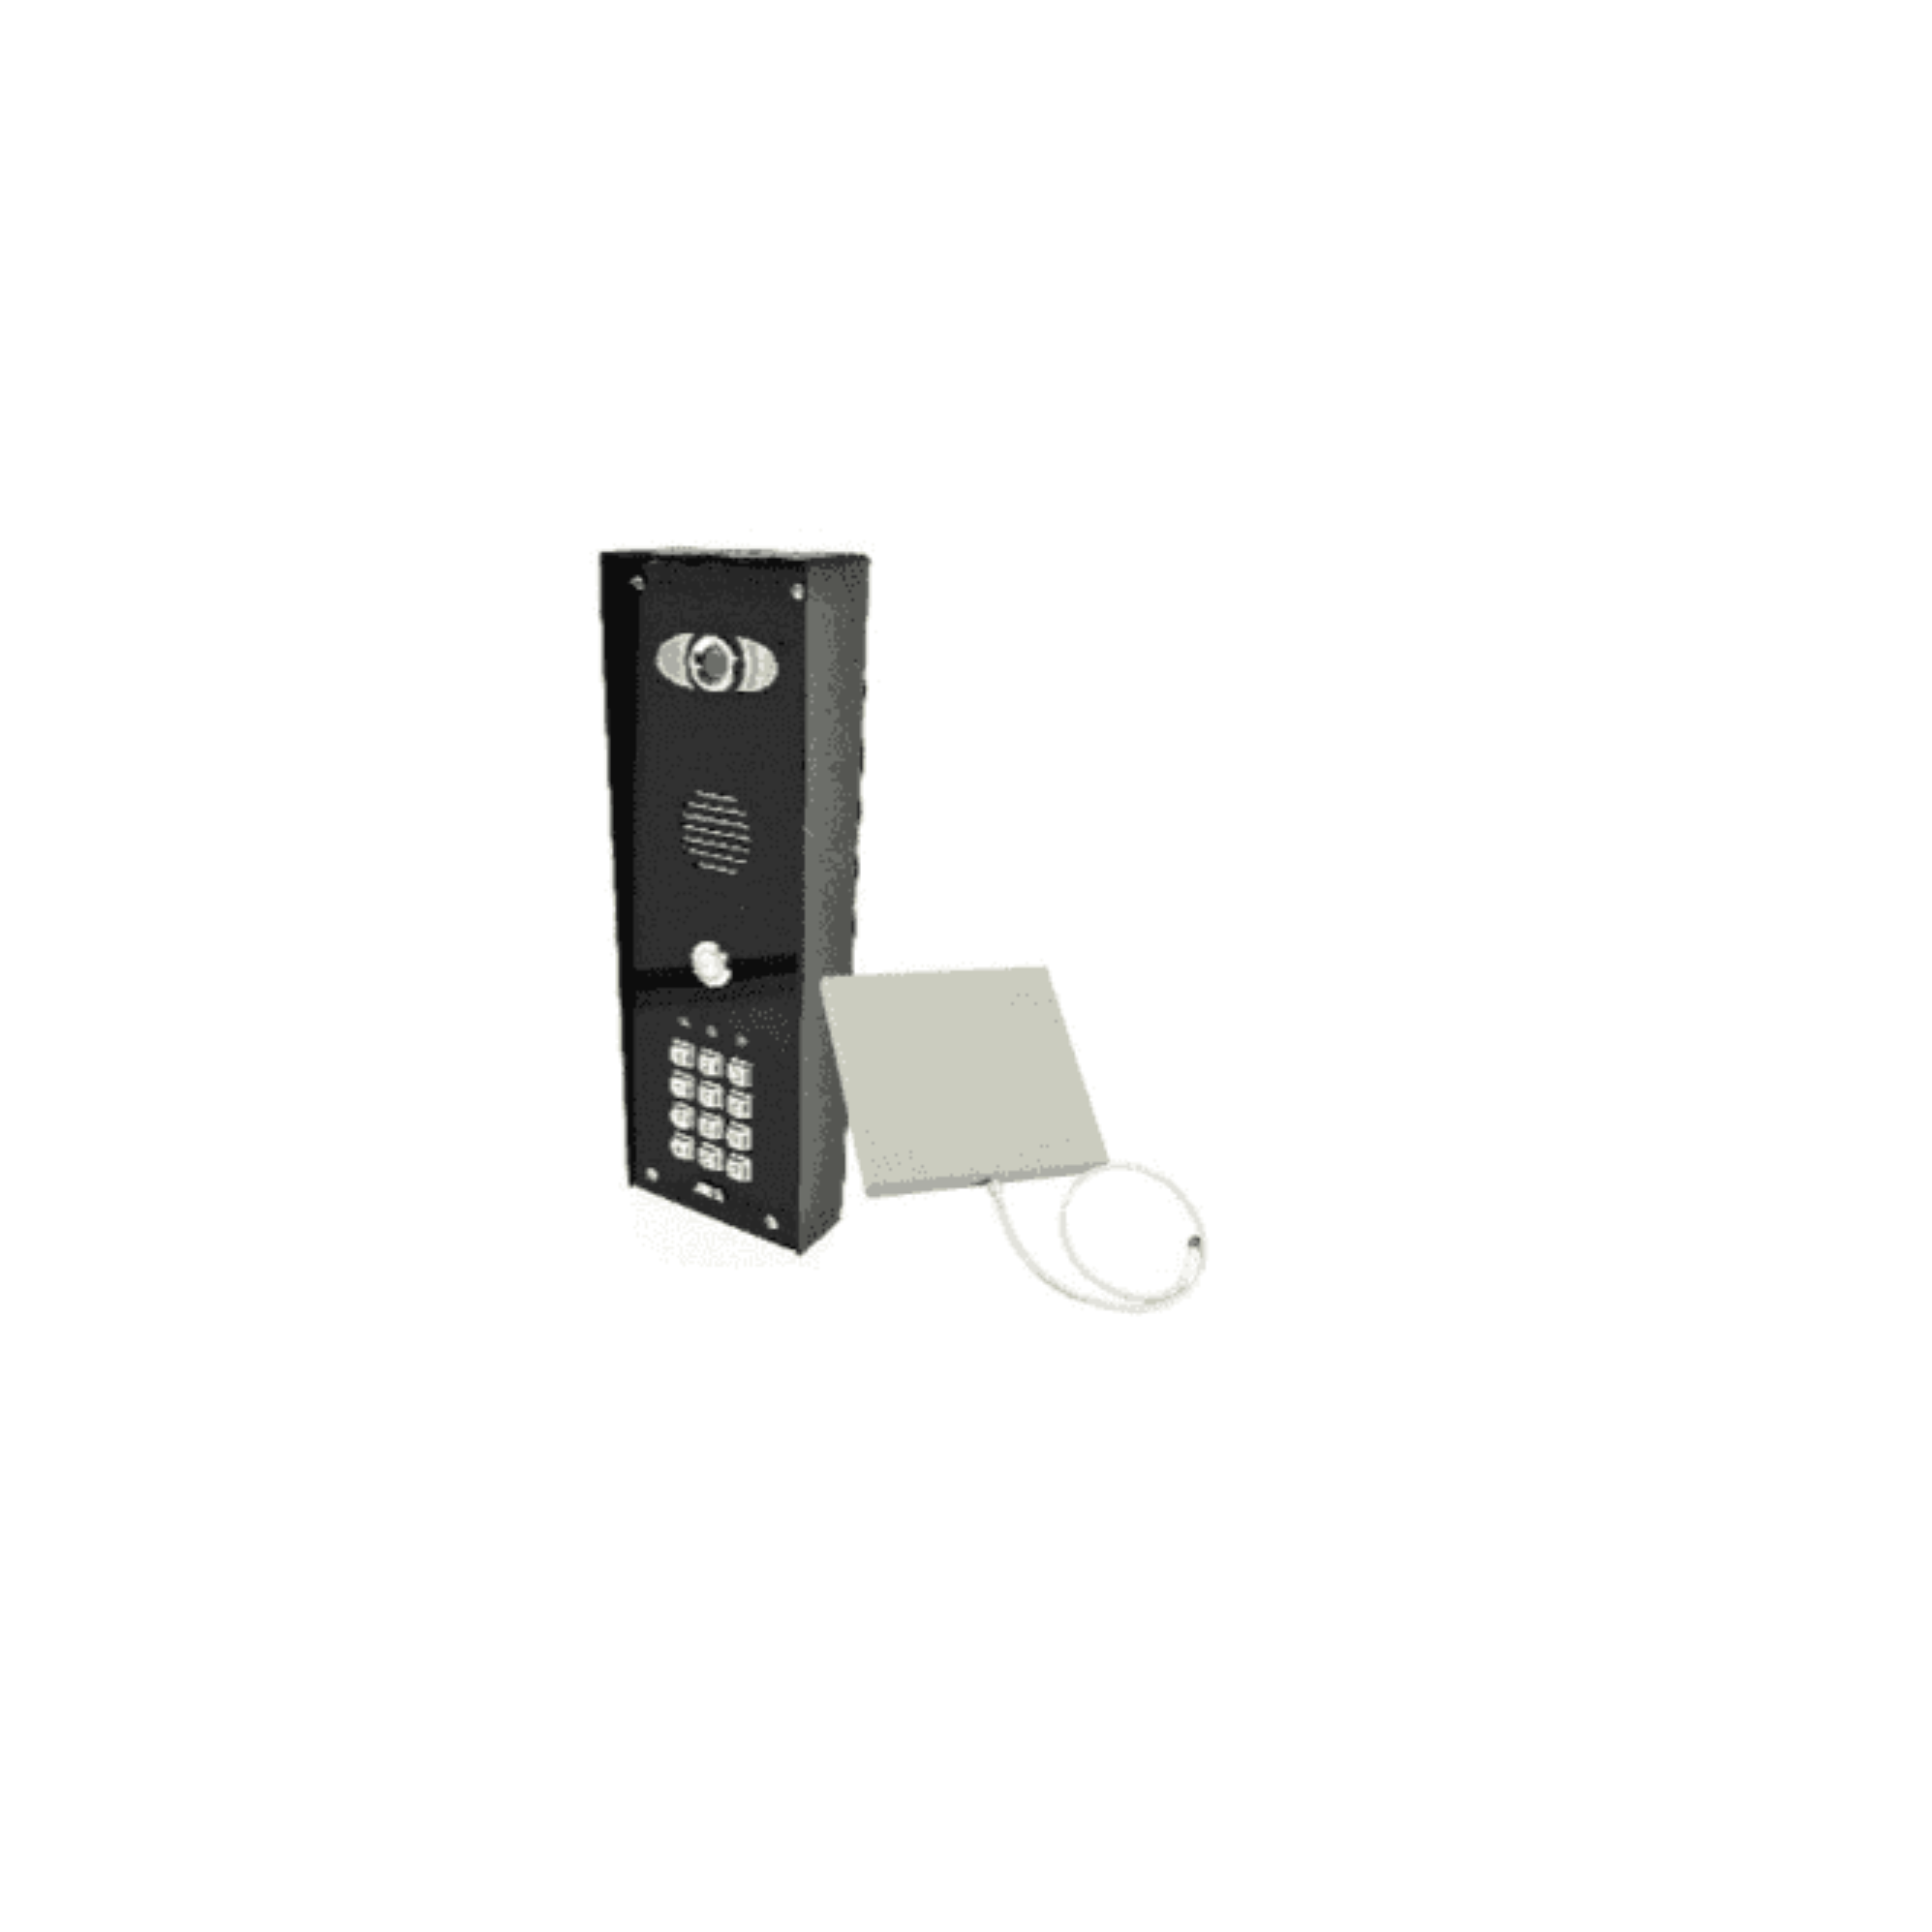 AES PRED2-WIFI-IMPK Imperial (Pedestal Mount) wifi intercom with keypad - New Wifi Predator Mark 2